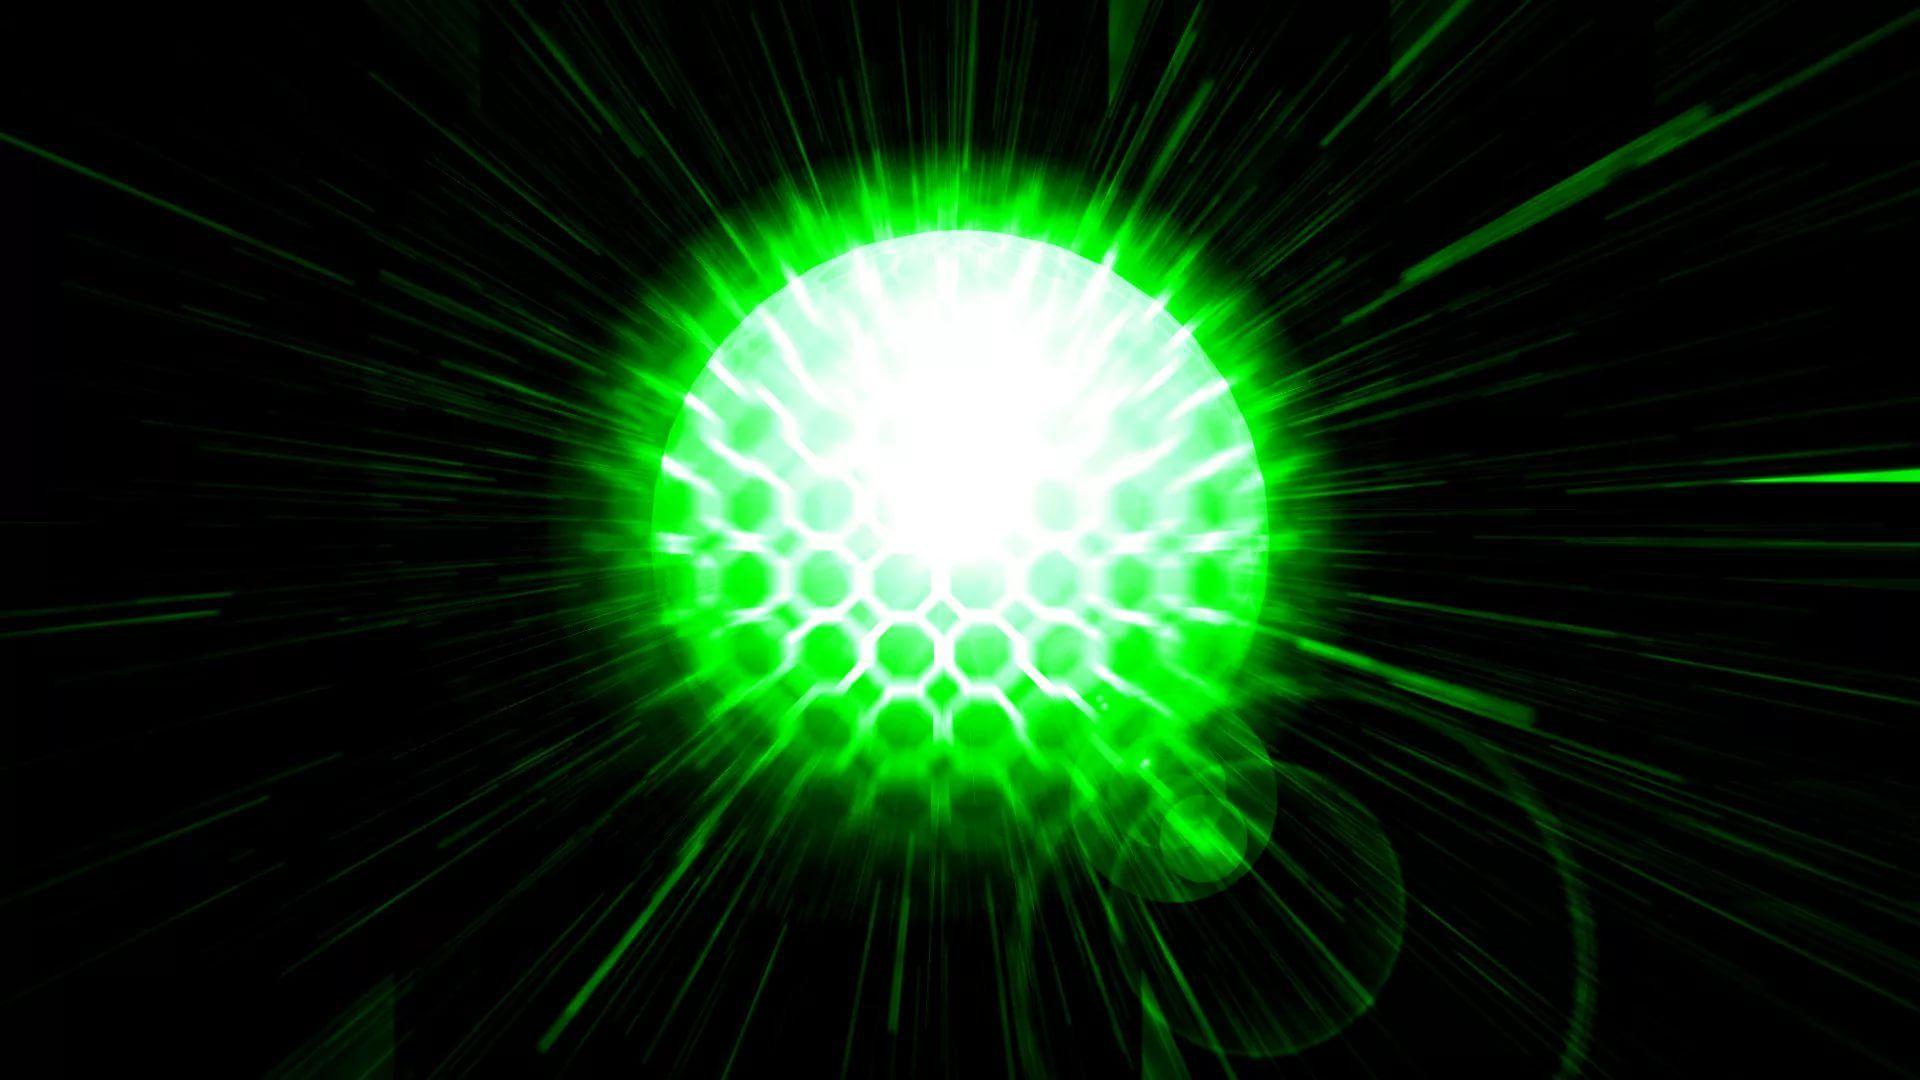 Neon Green pc wallpaper